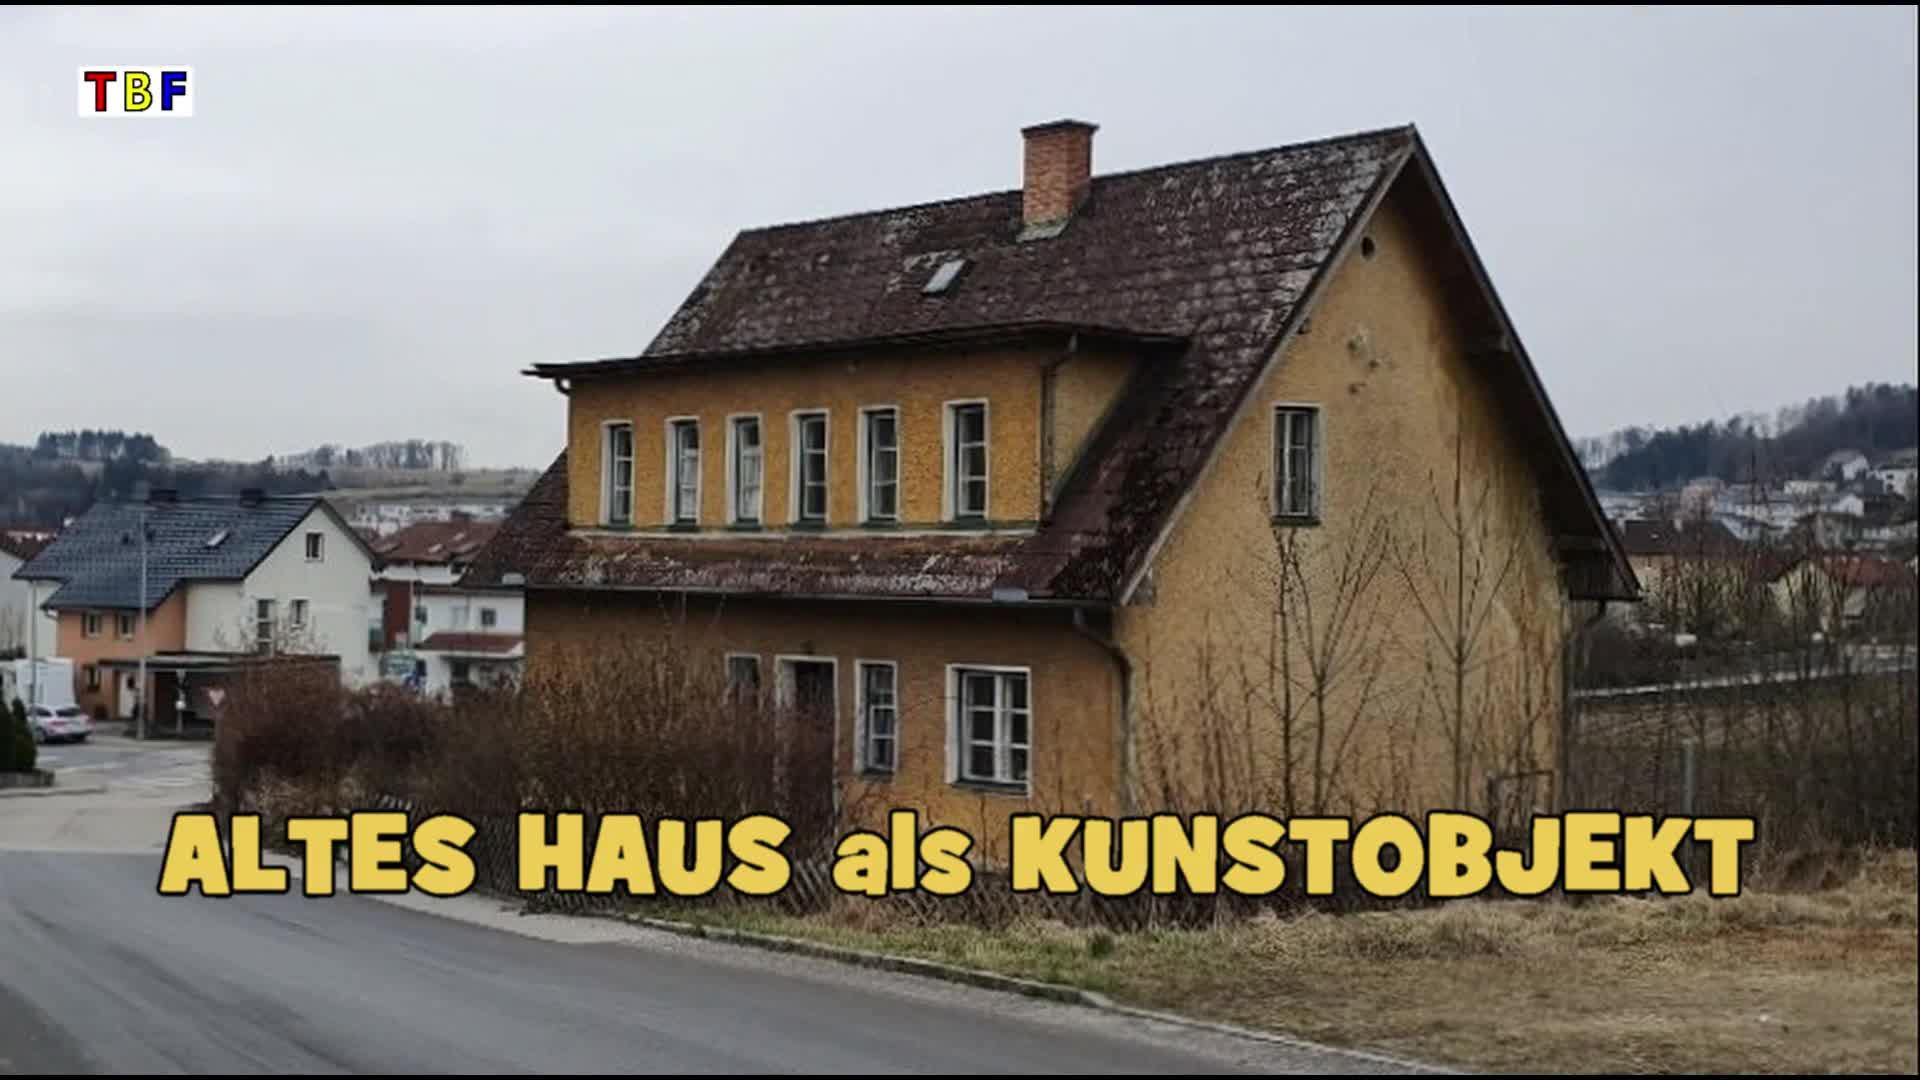 Altes Haus als Kunstobjekt